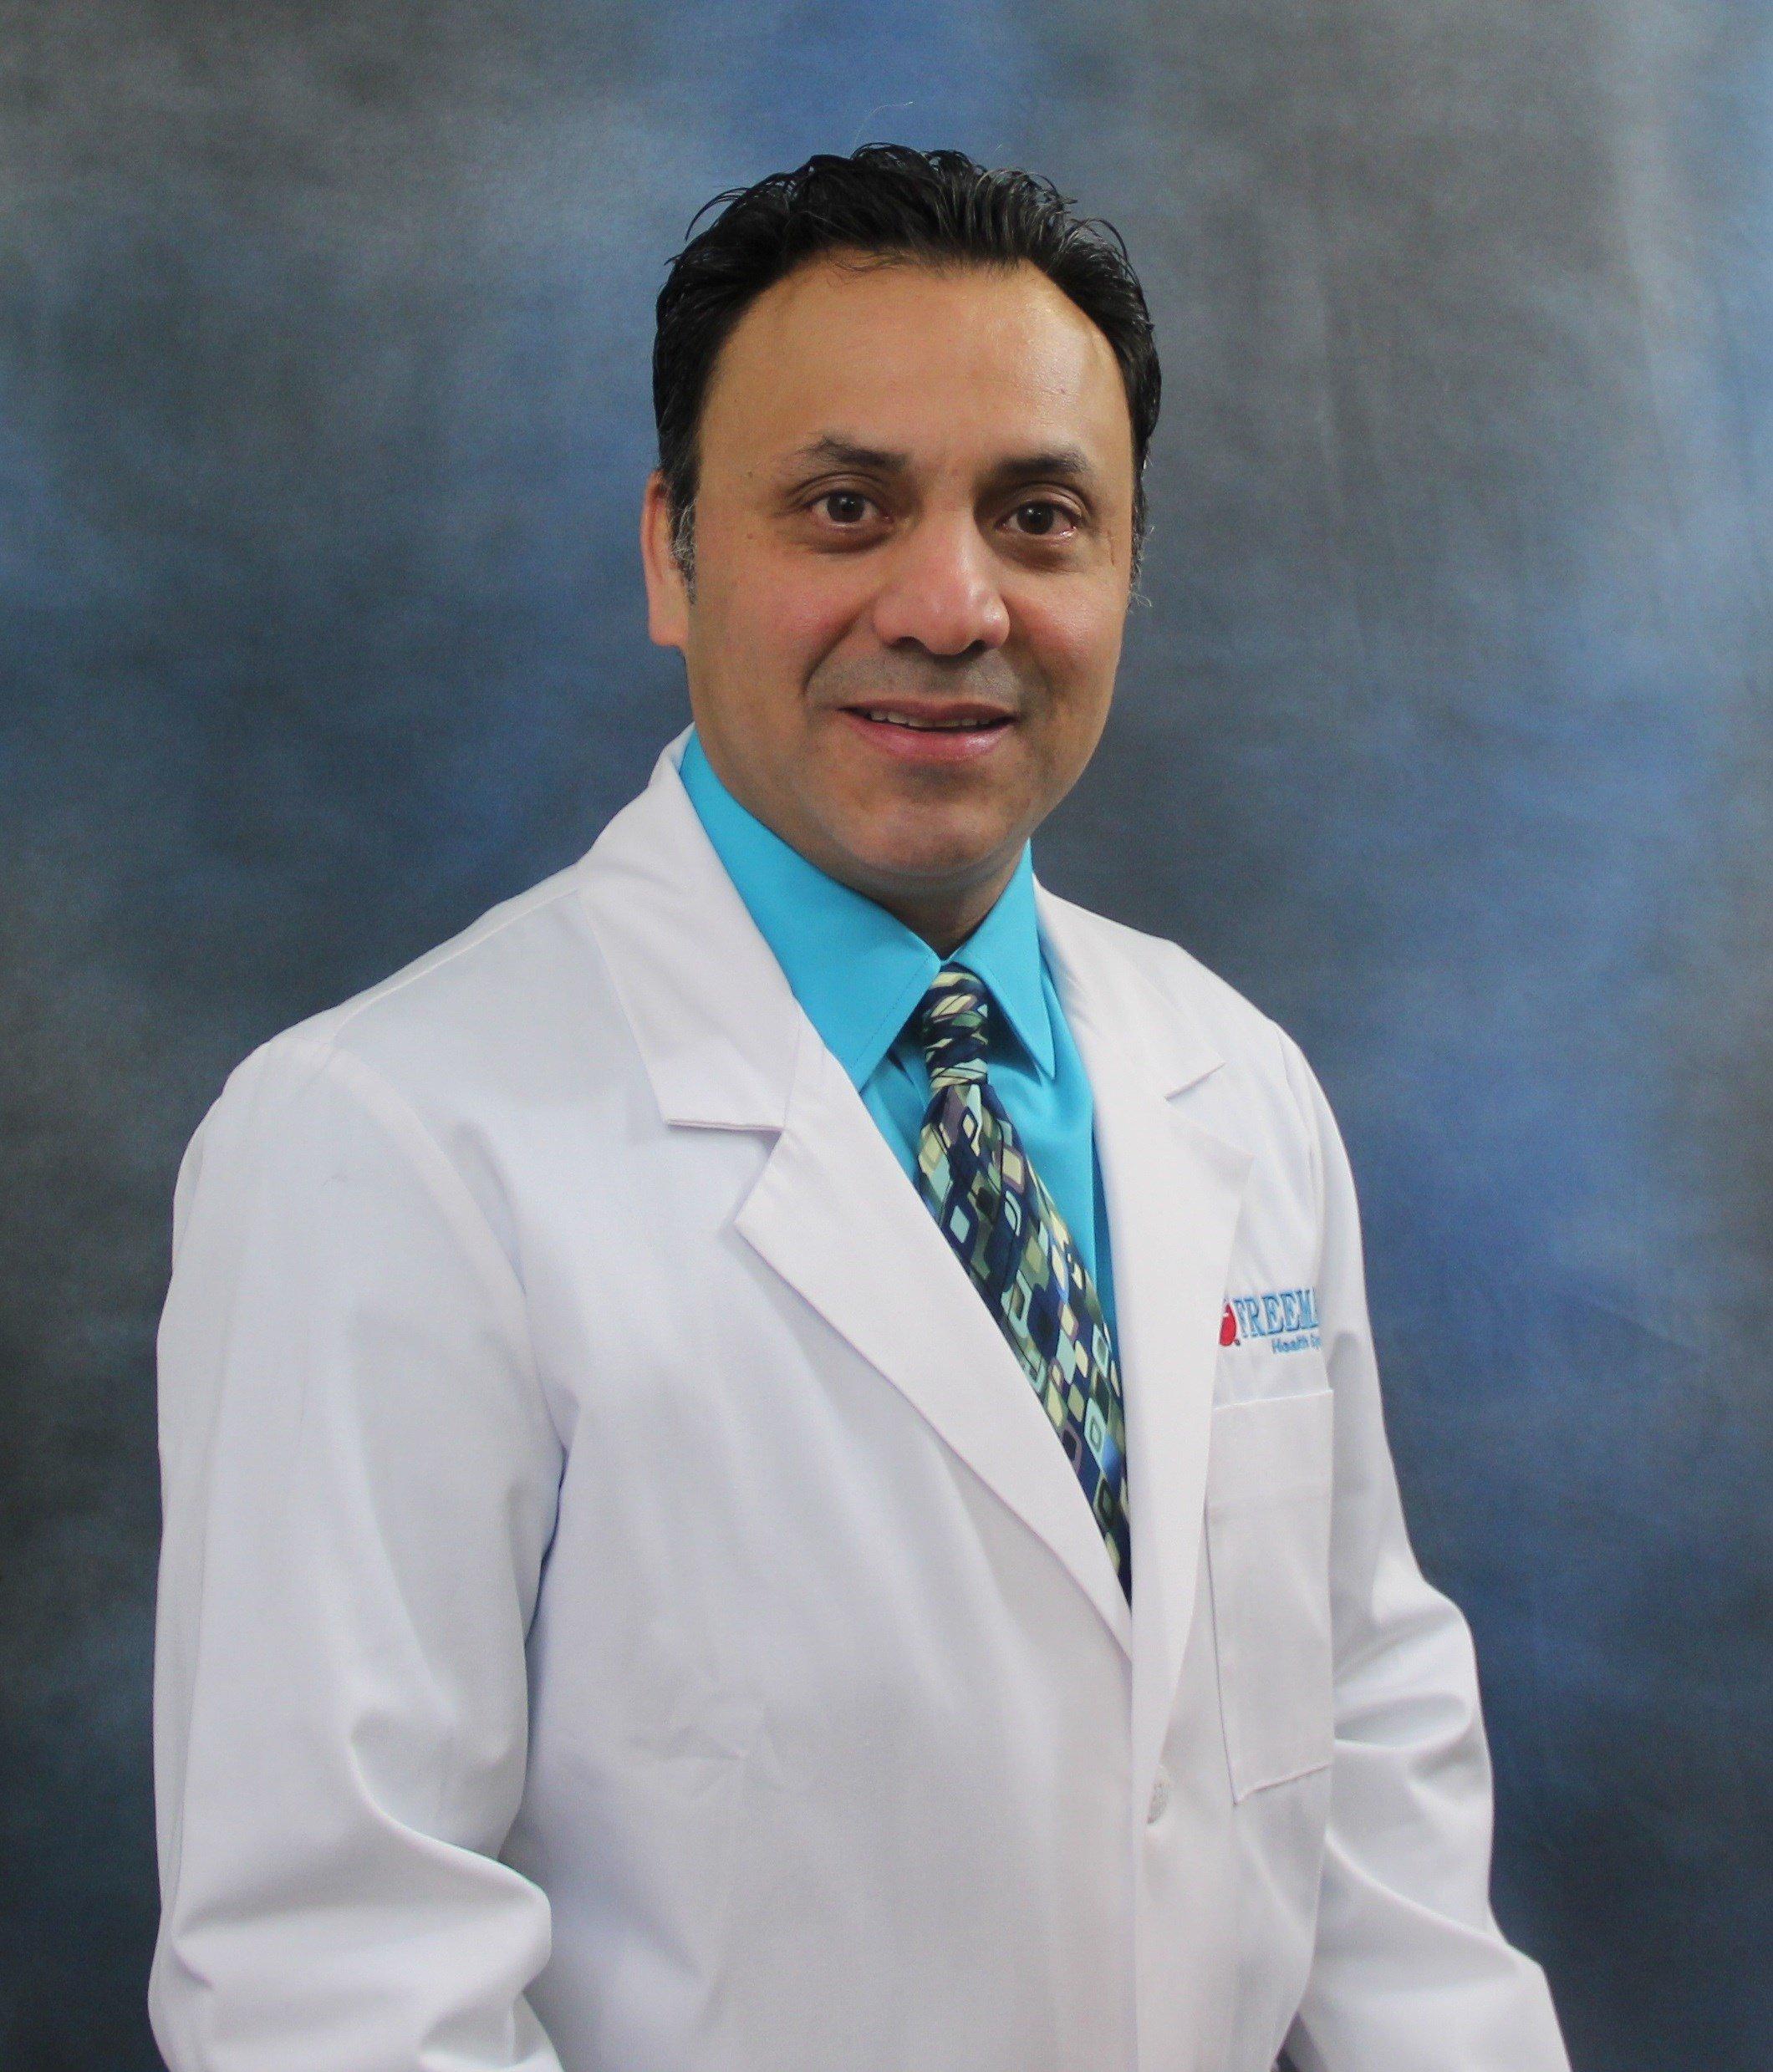 Dr. Anthony Casanova